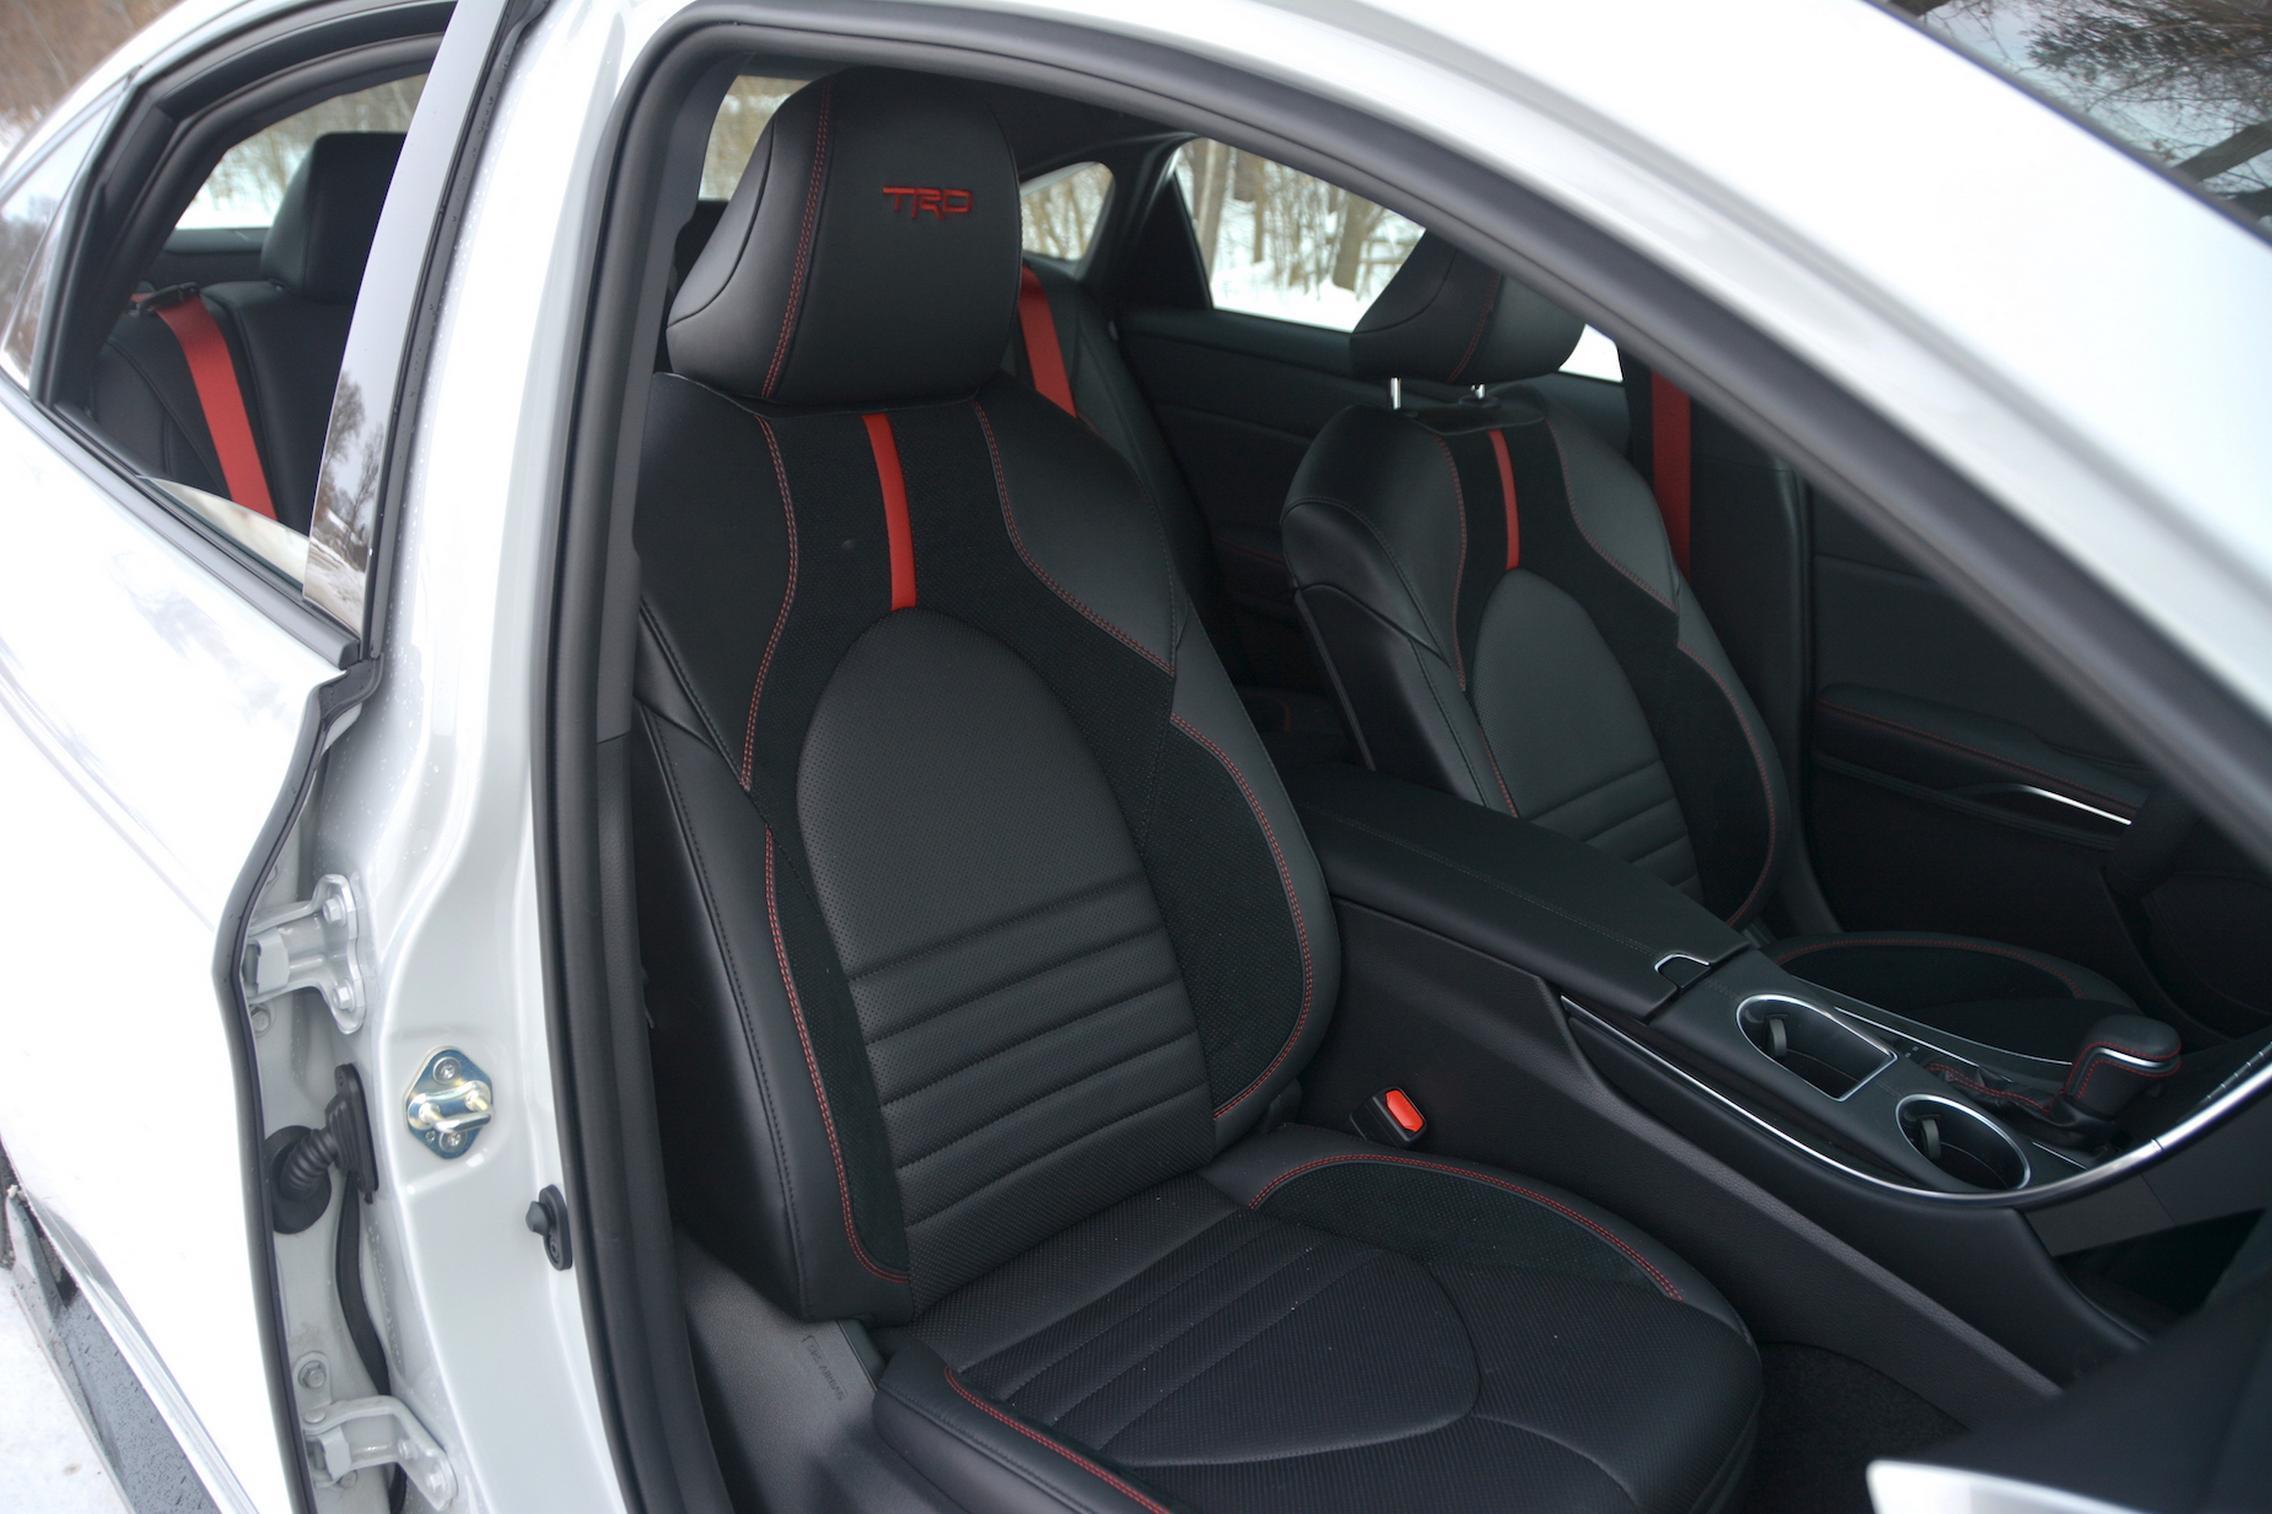 Toyota Avalon TRD front seats